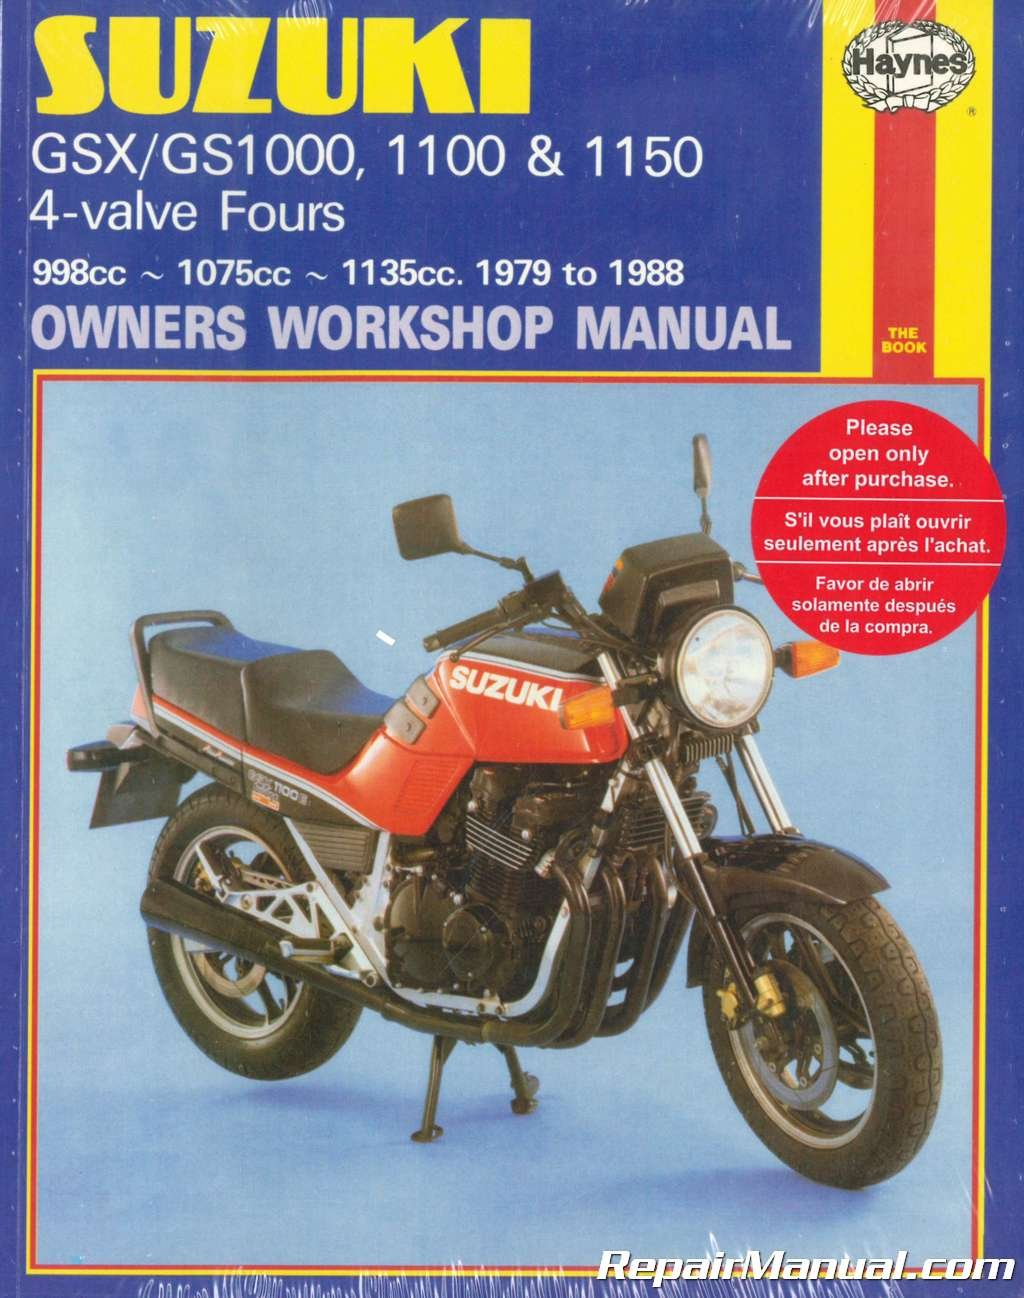 H737 Suzuki GSX GS1000 1100 1150 1980-1988 Haynes Motorcycle Repair Manual:  Manufacturer: Amazon.com: Books